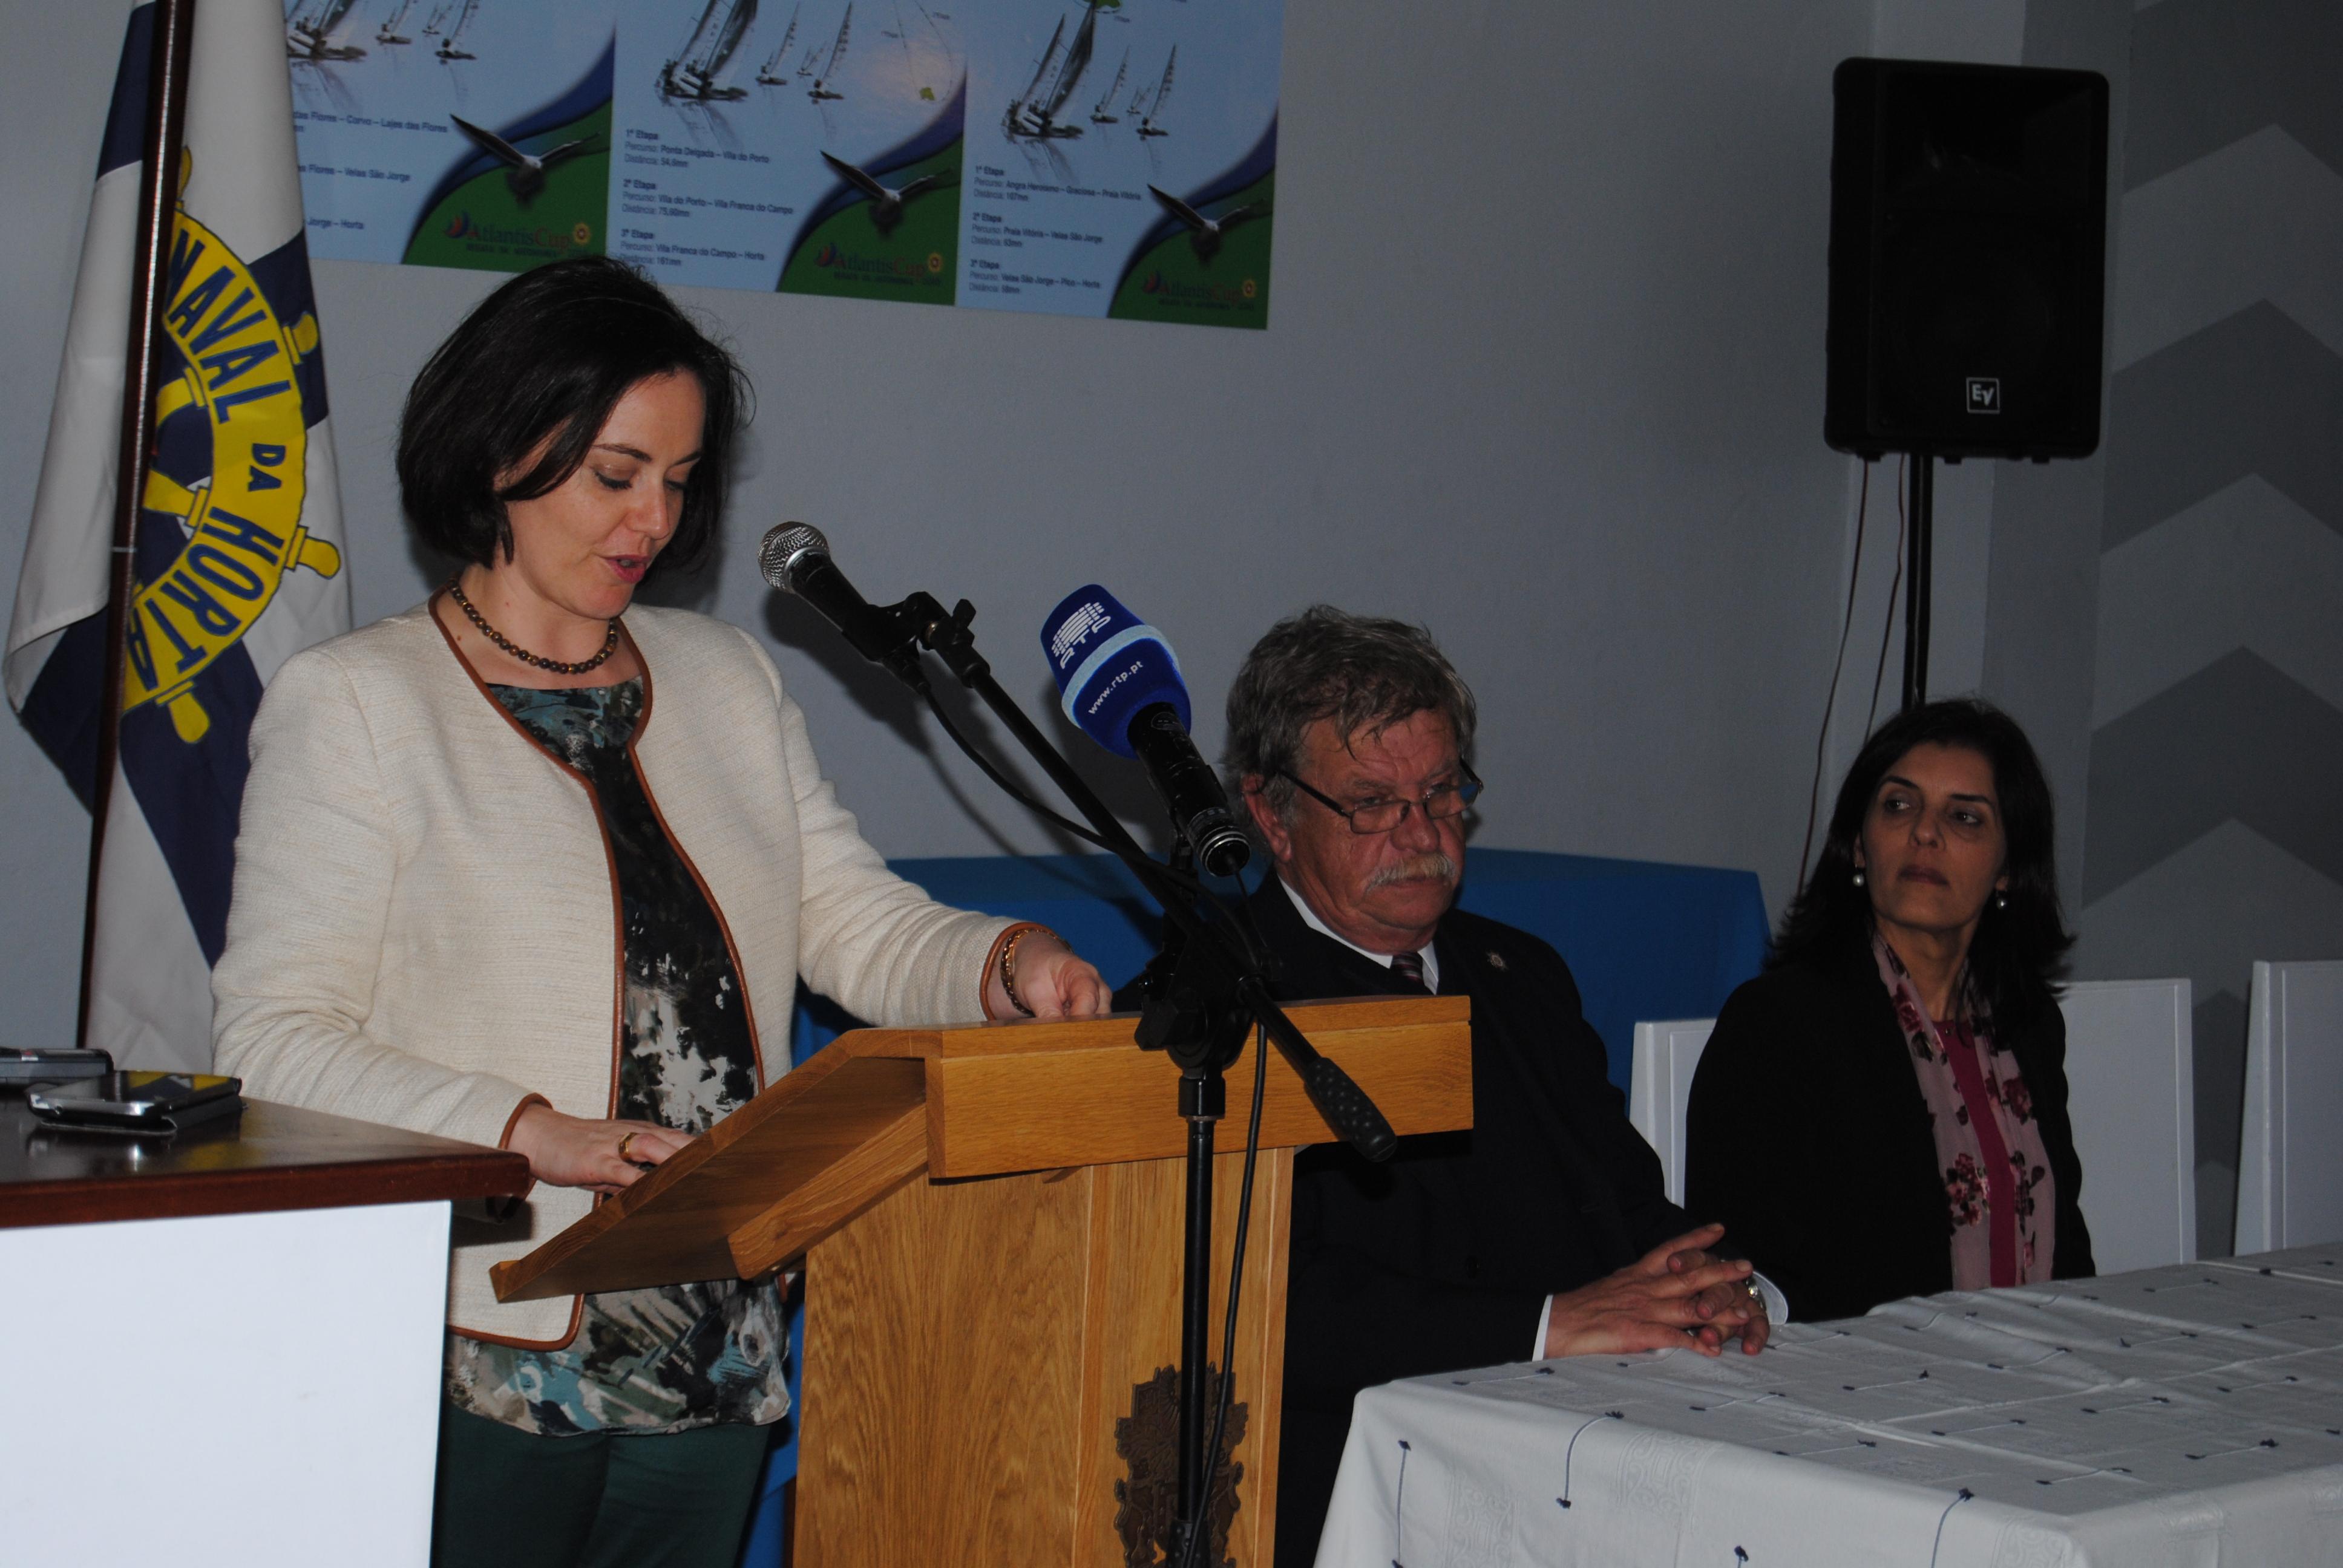 Ana Luísa Luís apela ao envolvimento de toda a sociedade para conquistar o desenvolvimento harmonioso nos Açores